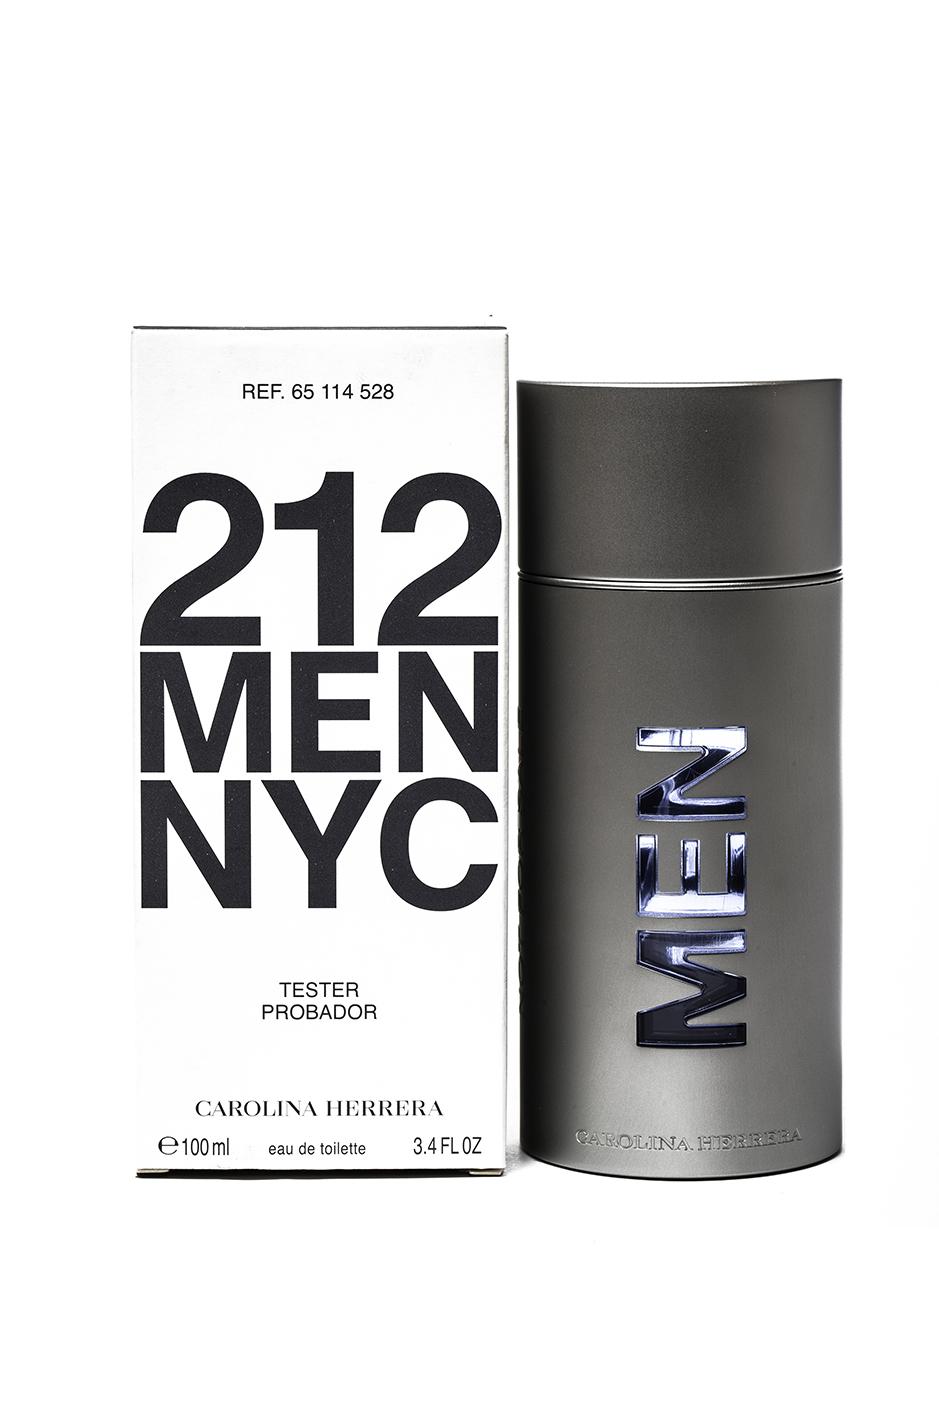 CarolinaHerrera212 men NYC 100ml Tester קרולינה הררה 212 ניו יורק סיטי לגבר 100מל טסטר